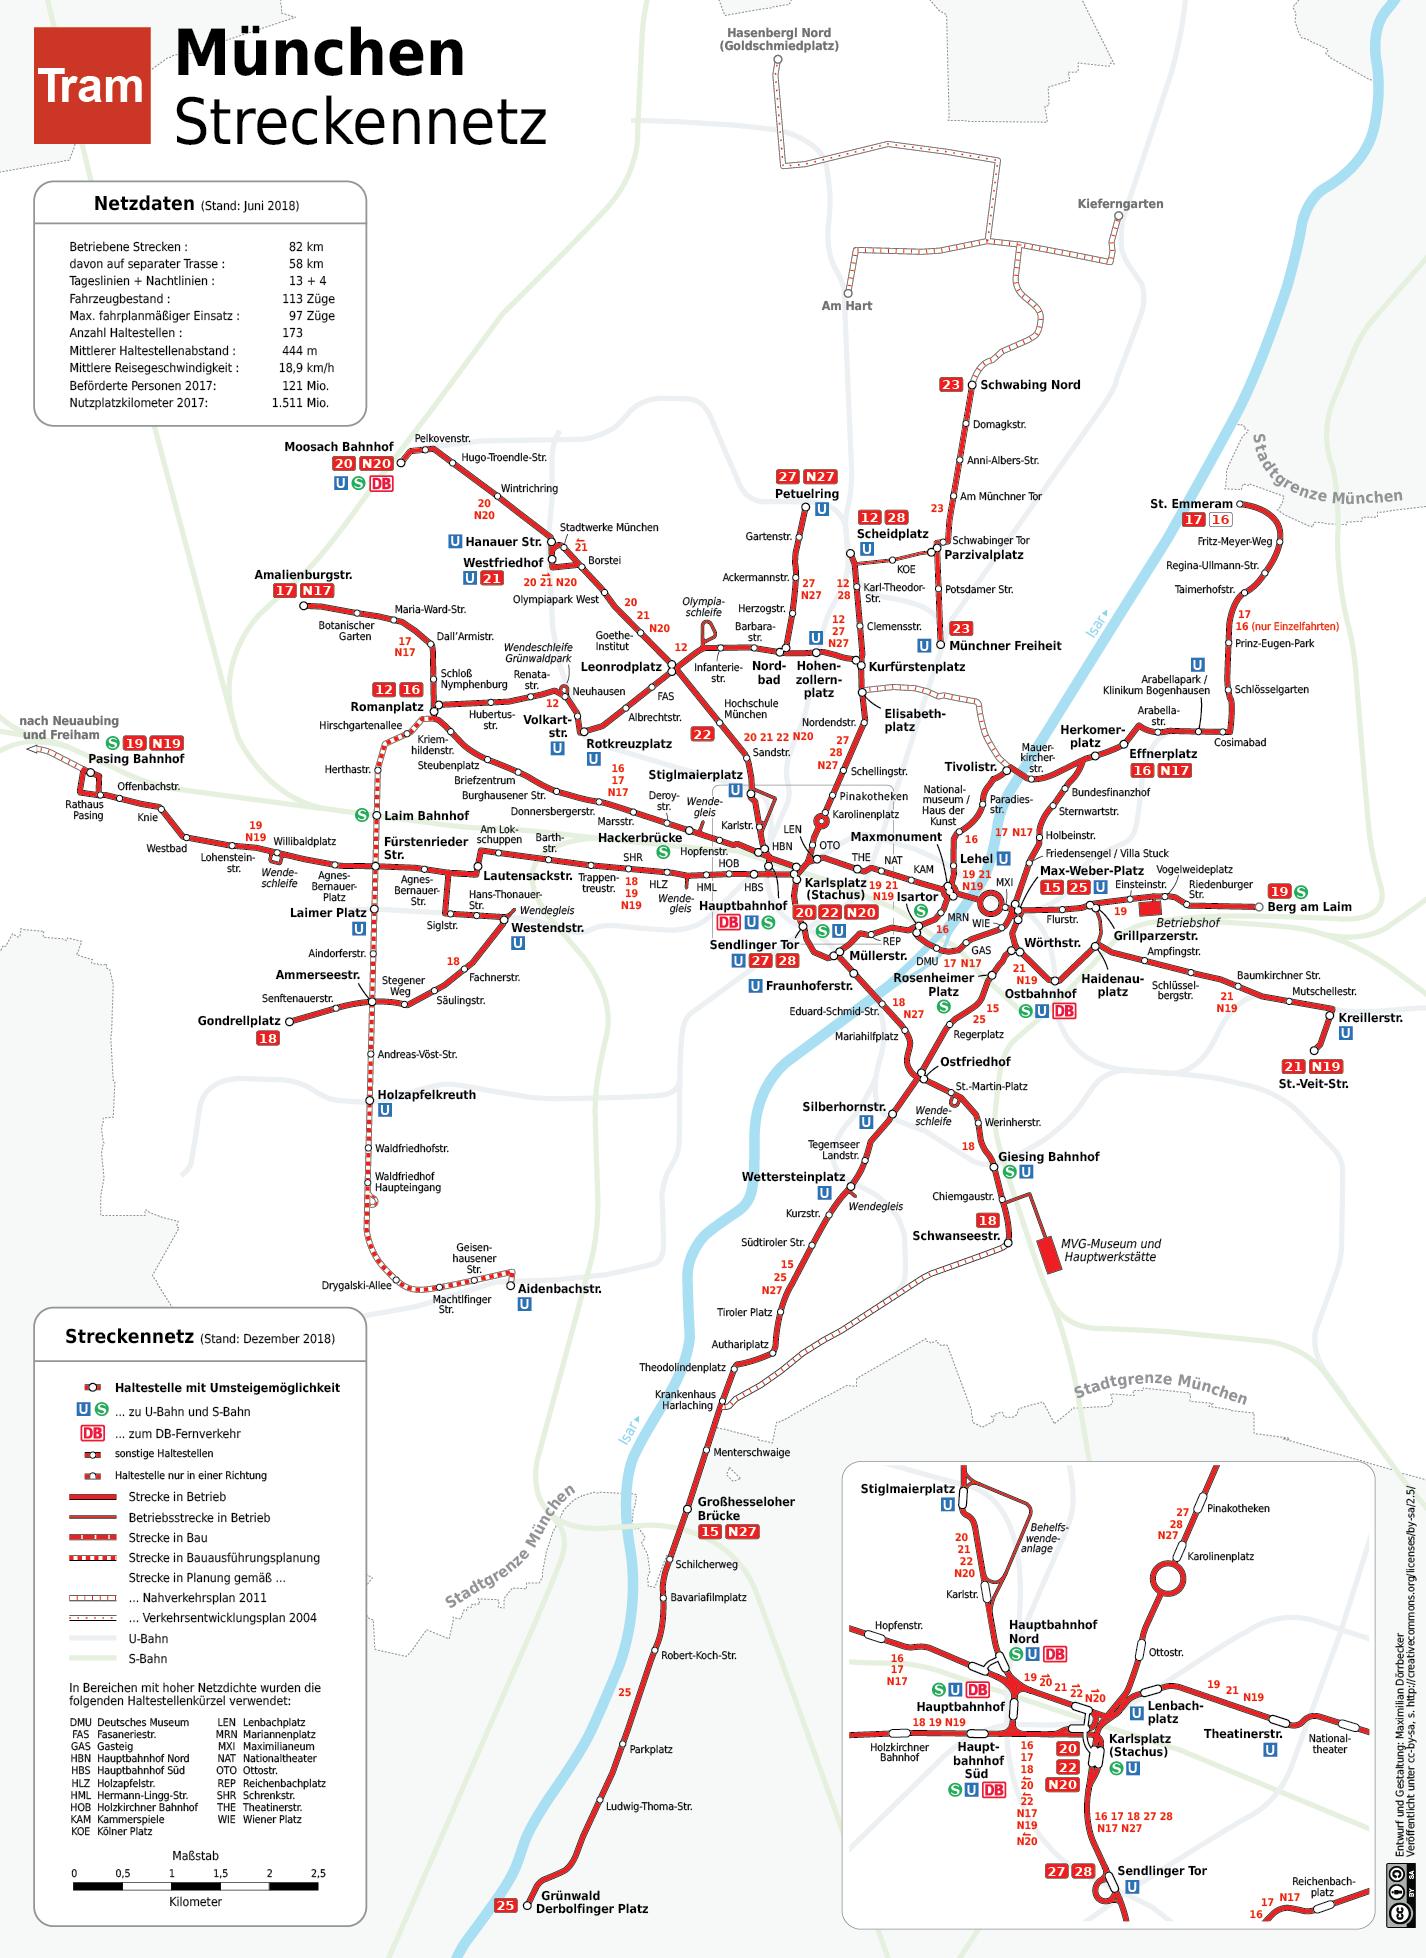 Straßenbahn München Wikipedia